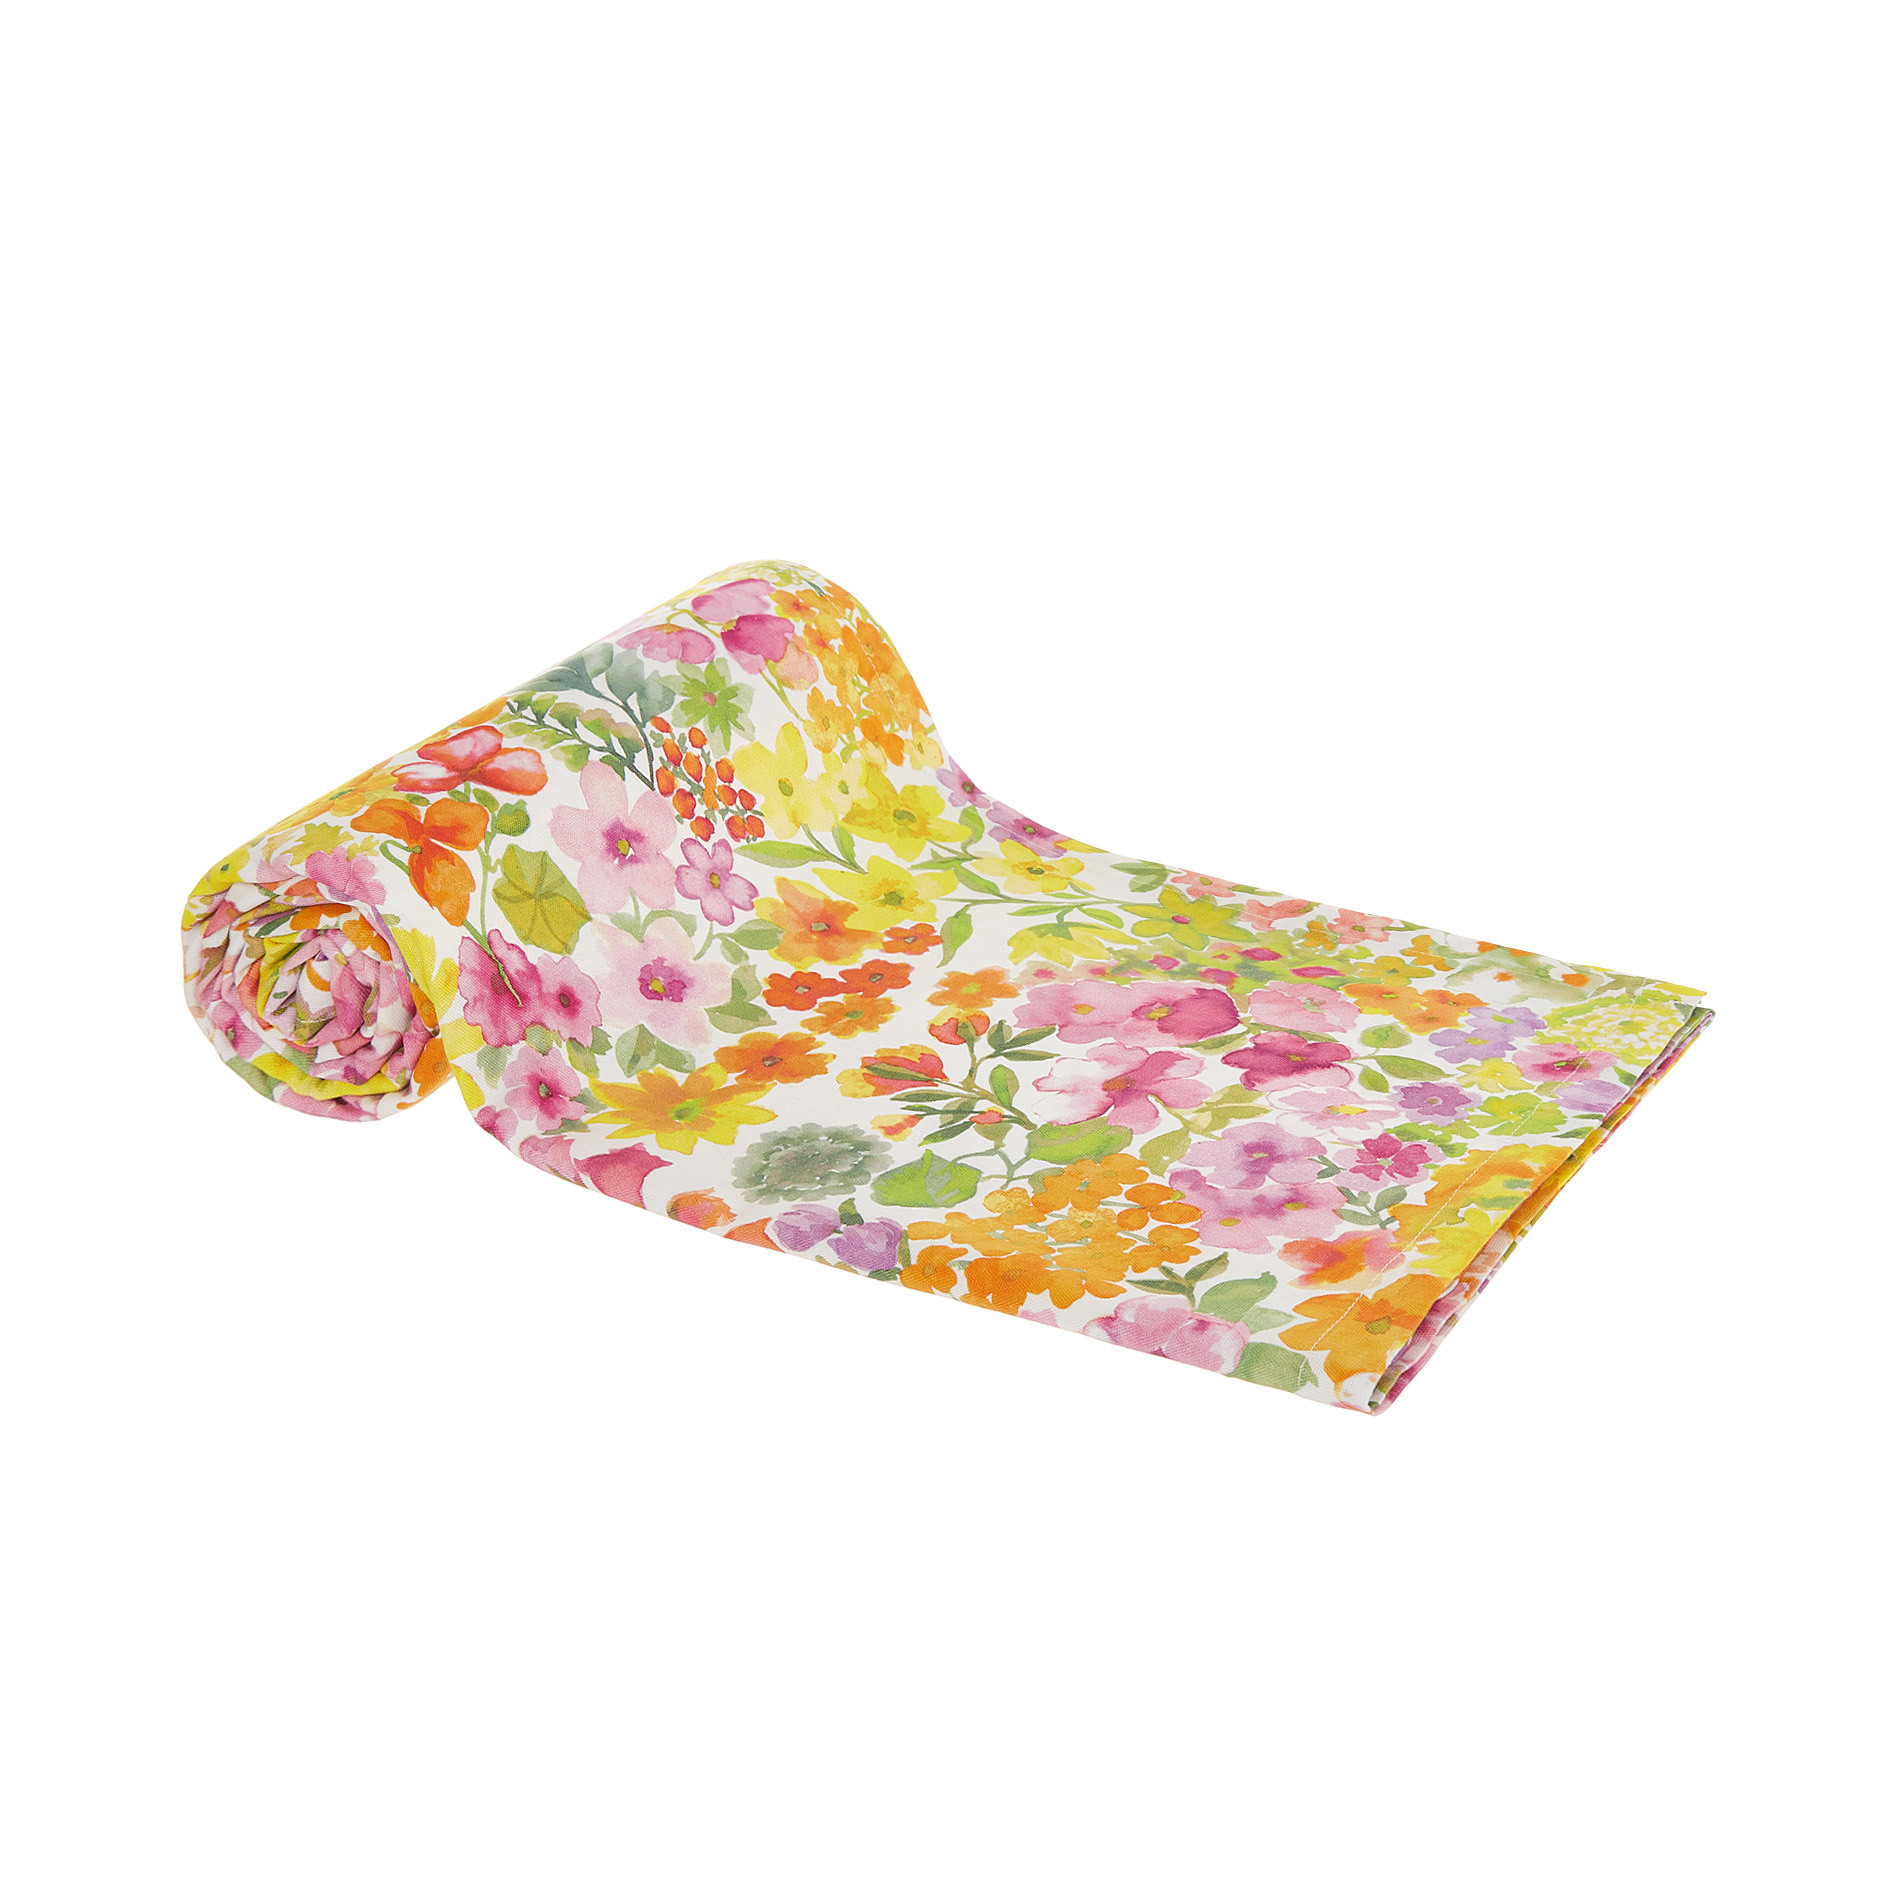 Telo arredo cotone motivo floreale, Multicolor, large image number 0